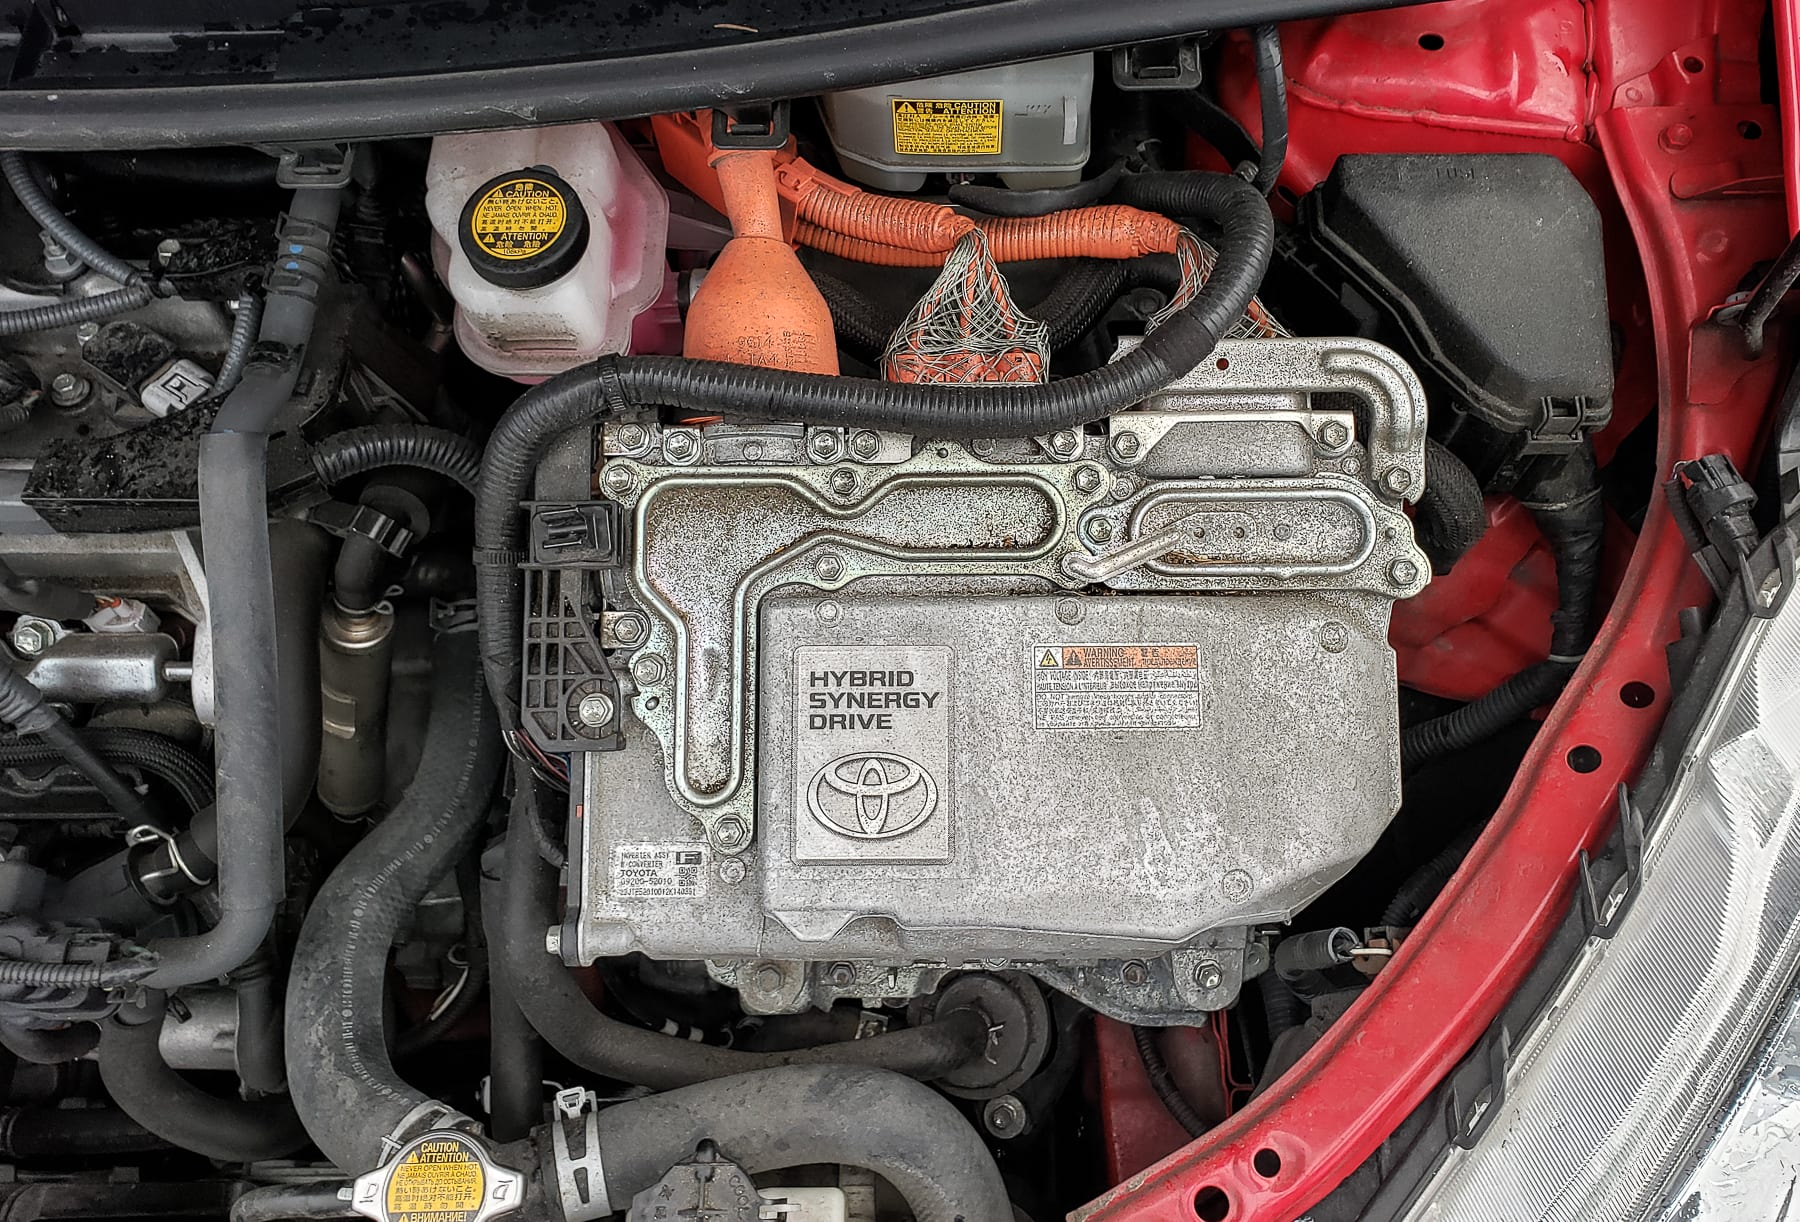 2012 Toyota Prius C Maintenance Service